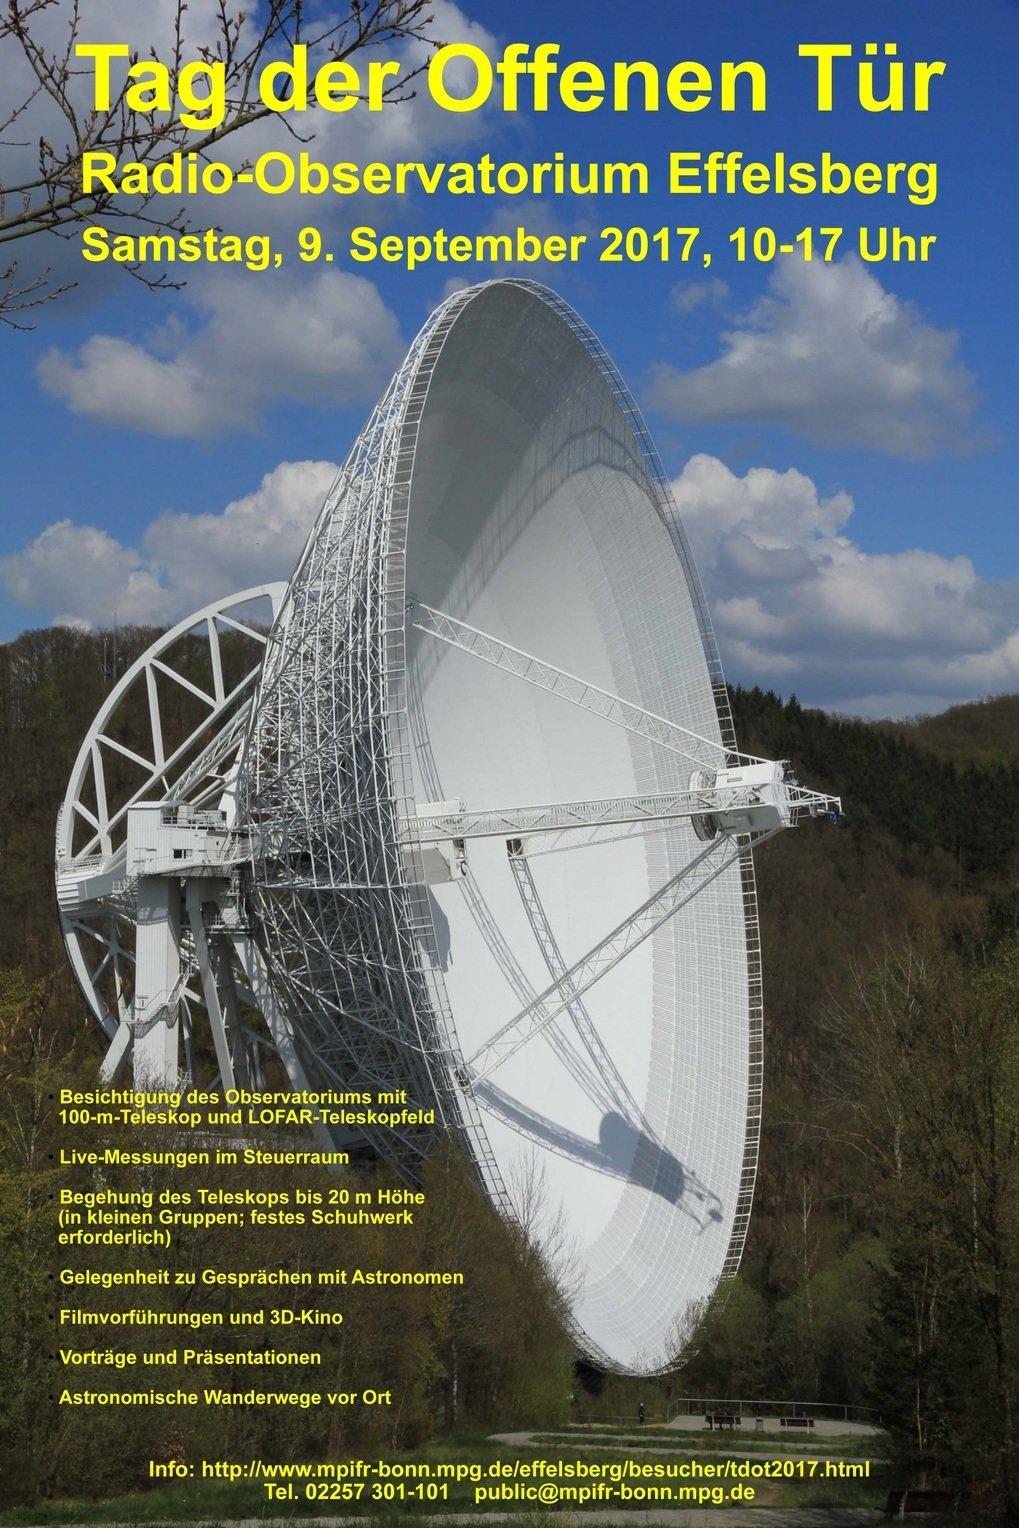 tag der offenen t r am 100 m radioteleskop effelsberg max planck institut f r radioastronomie. Black Bedroom Furniture Sets. Home Design Ideas